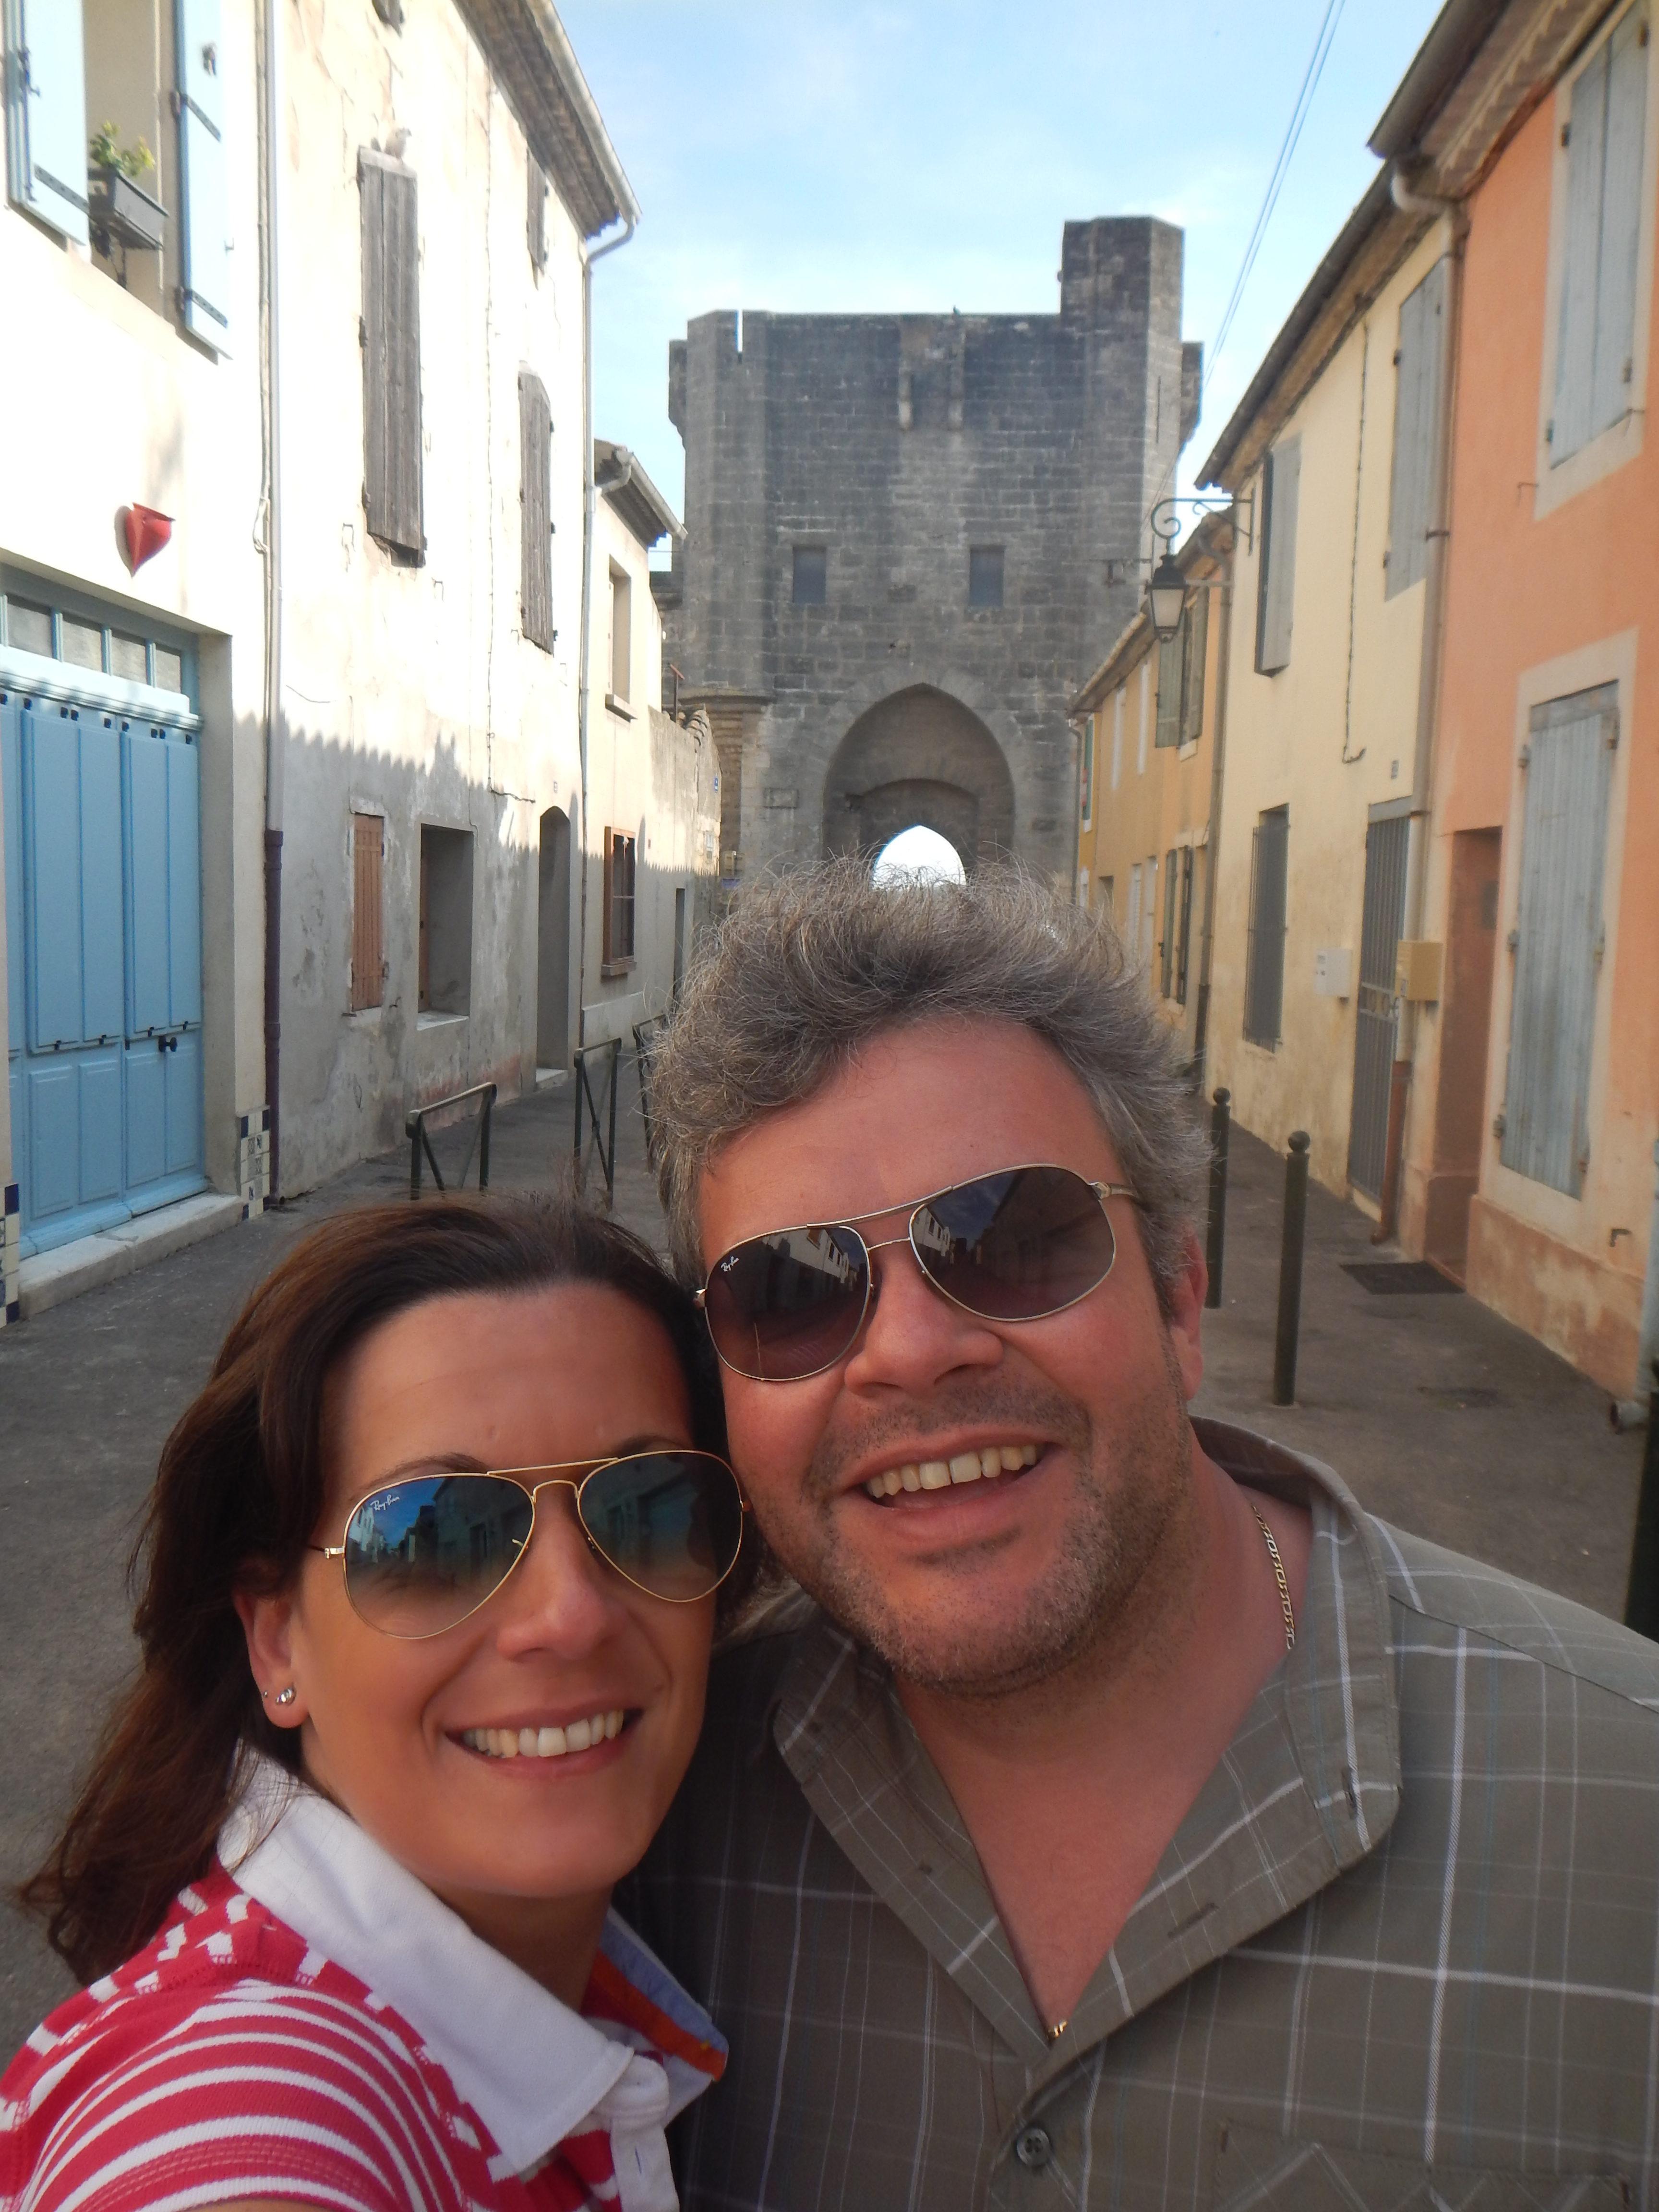 La scoperta della nostra Camargue, Saintes Maries de la Mer - giugno 2015